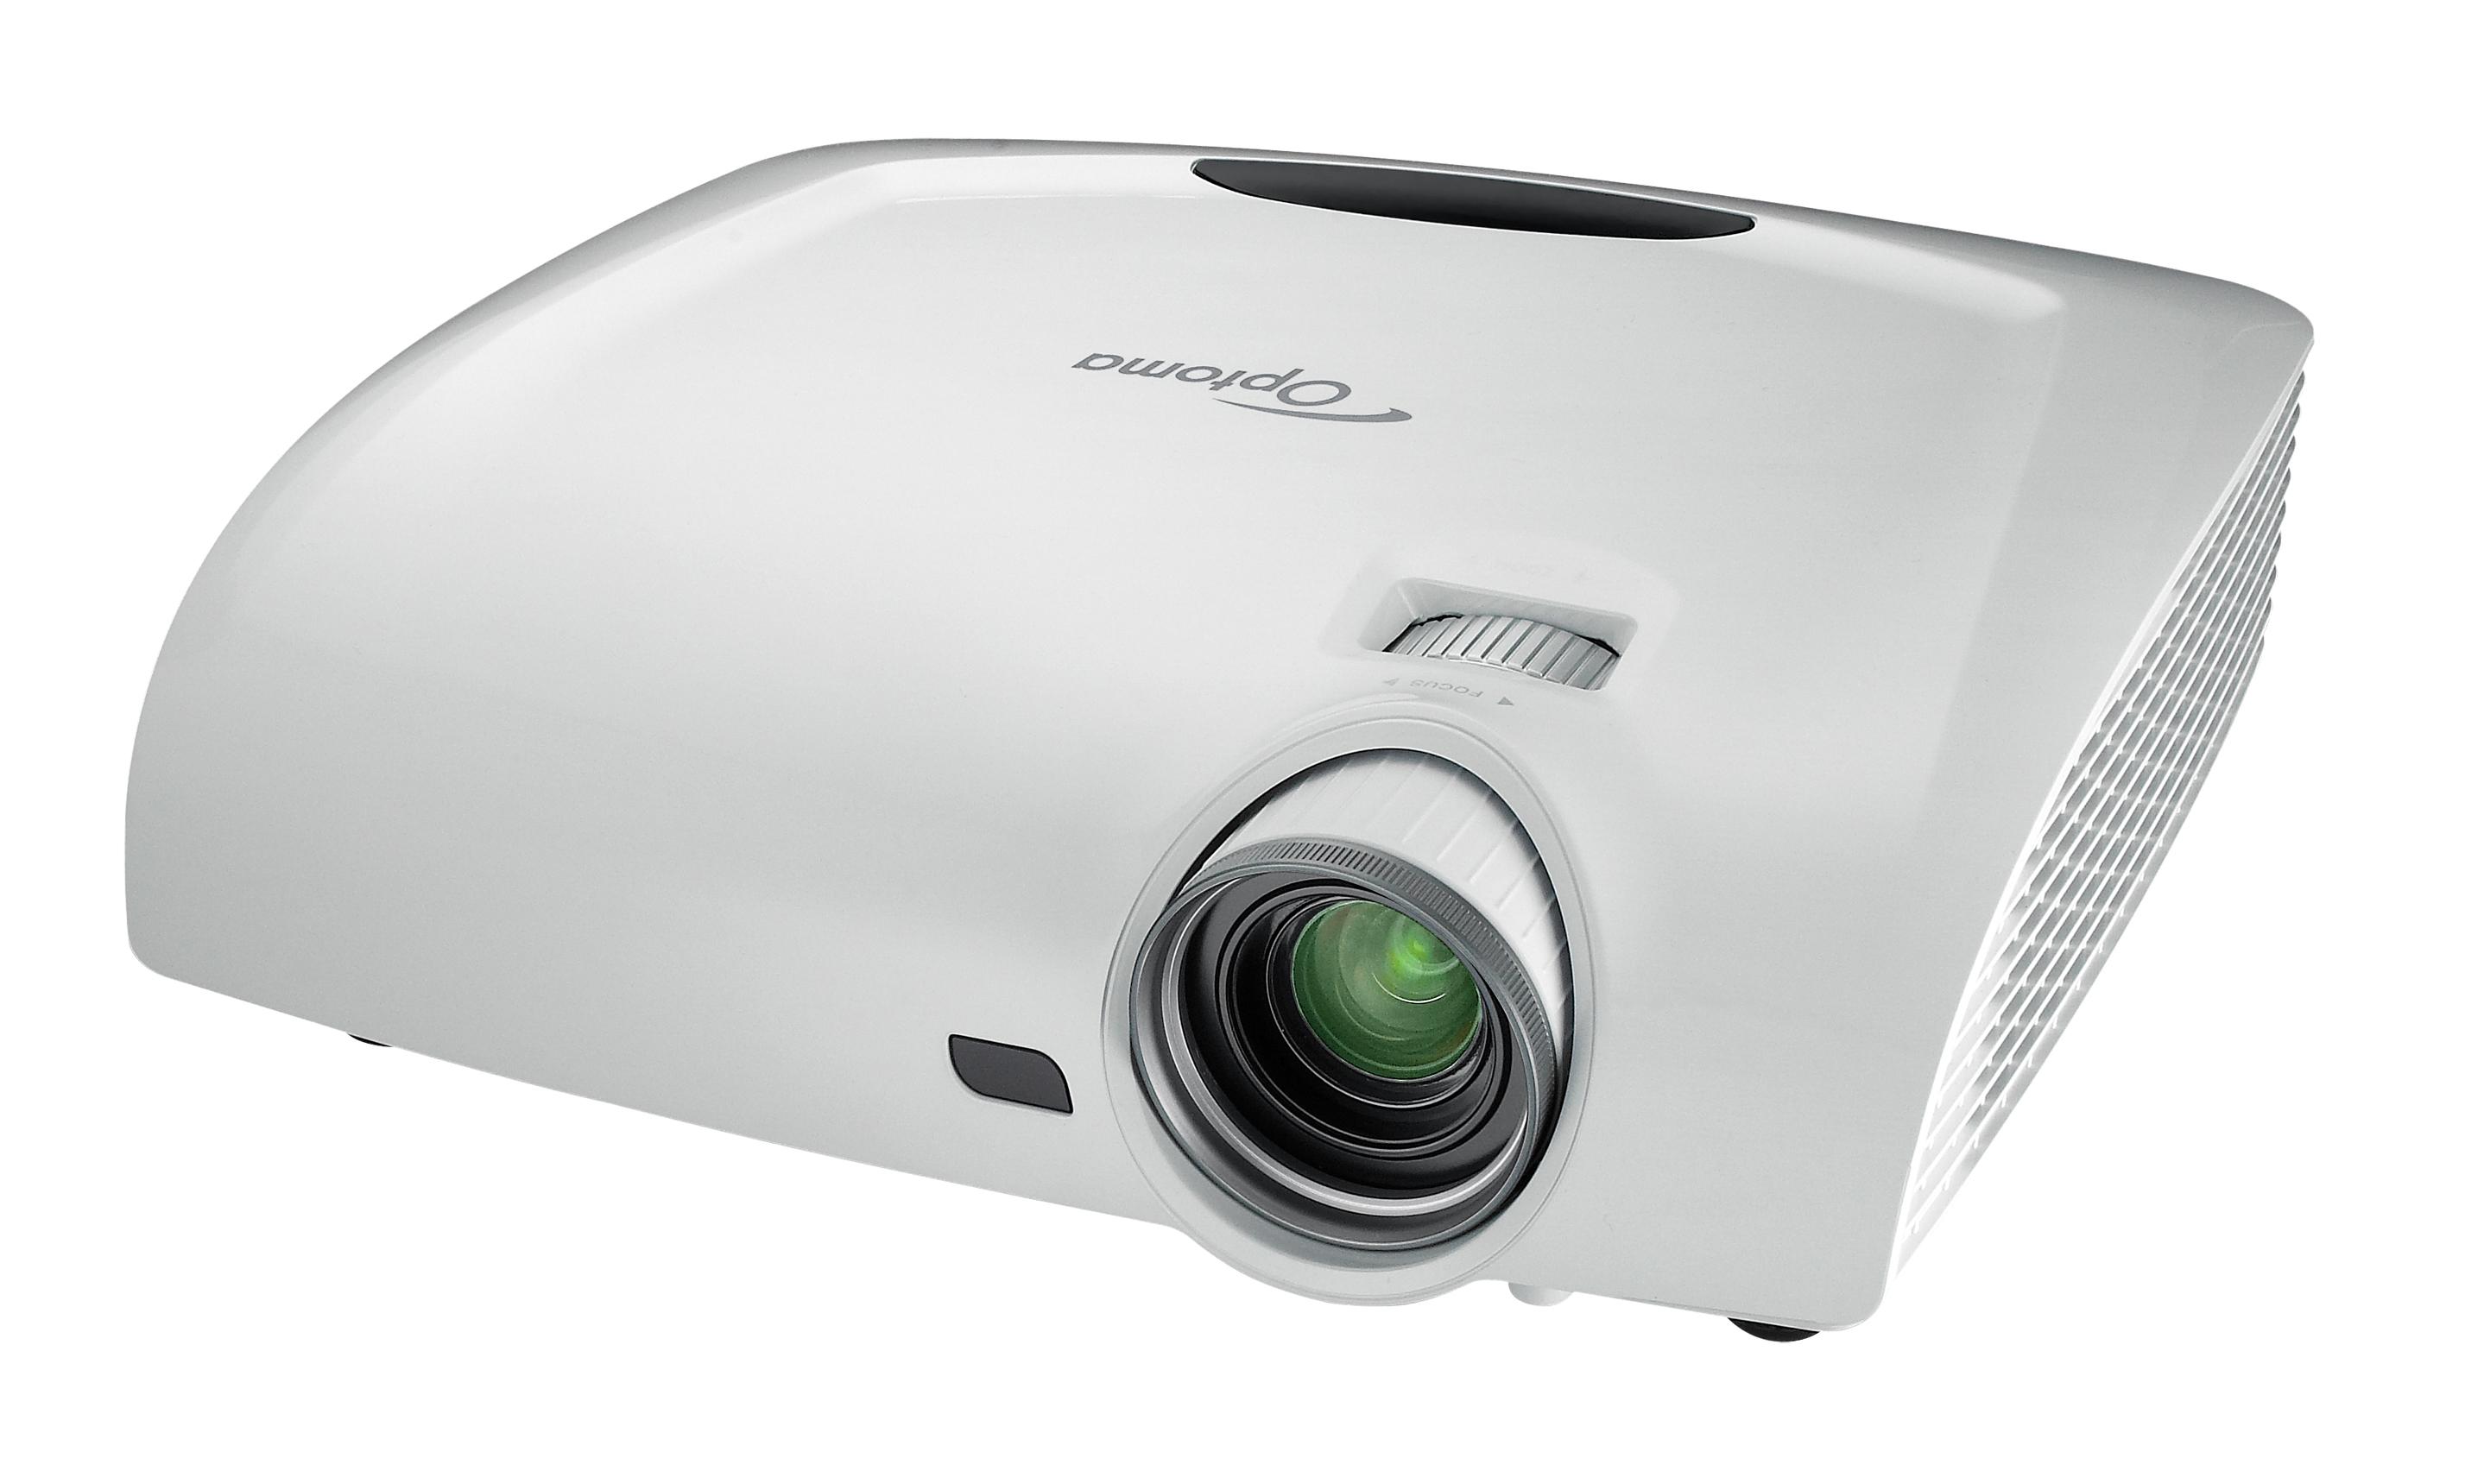 3D大画面ホームシアターがこの価格で! フルHD プロジェクターHD33S1 オプトマから新登場!!